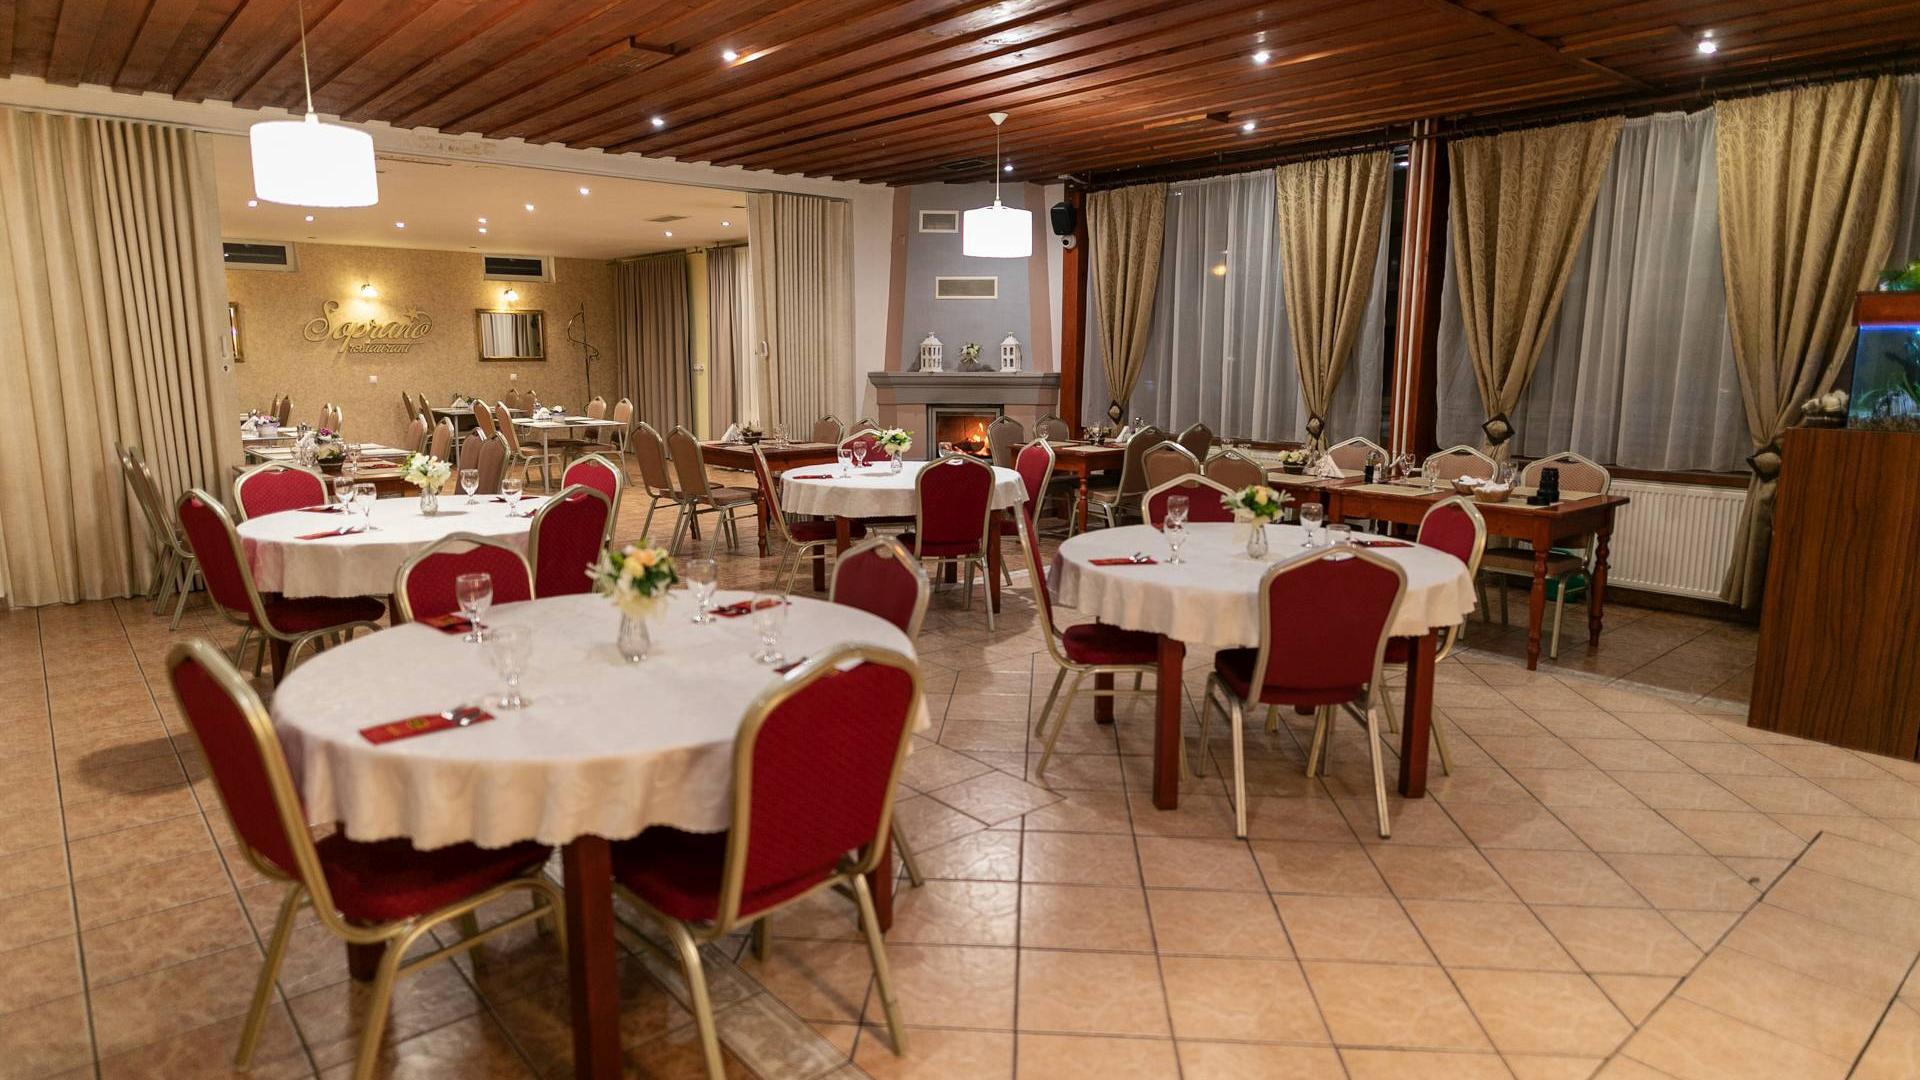 Reštaurácia - banketka - terasa